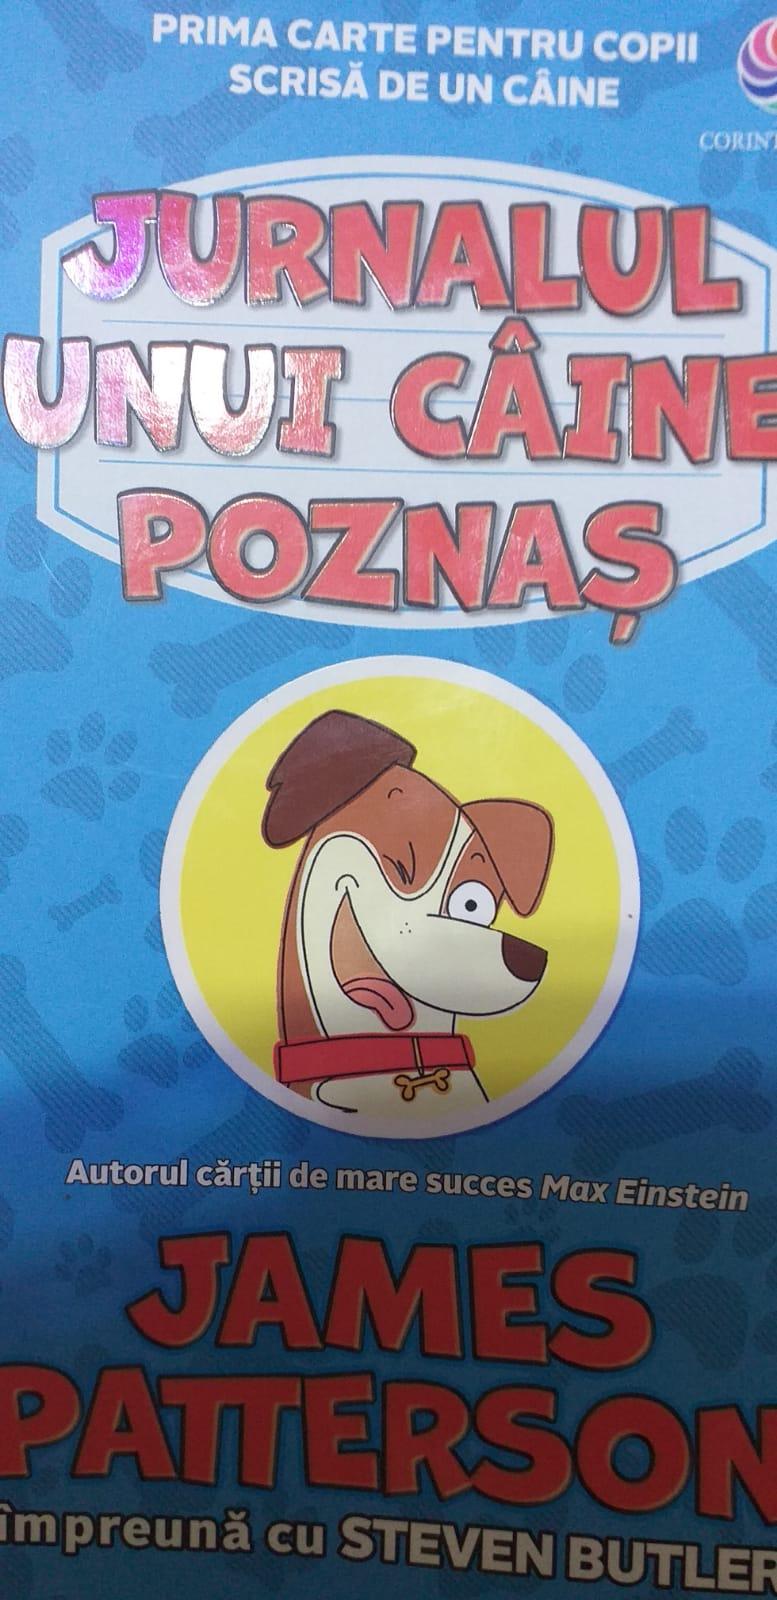 Jurnalul unui câine posnaș